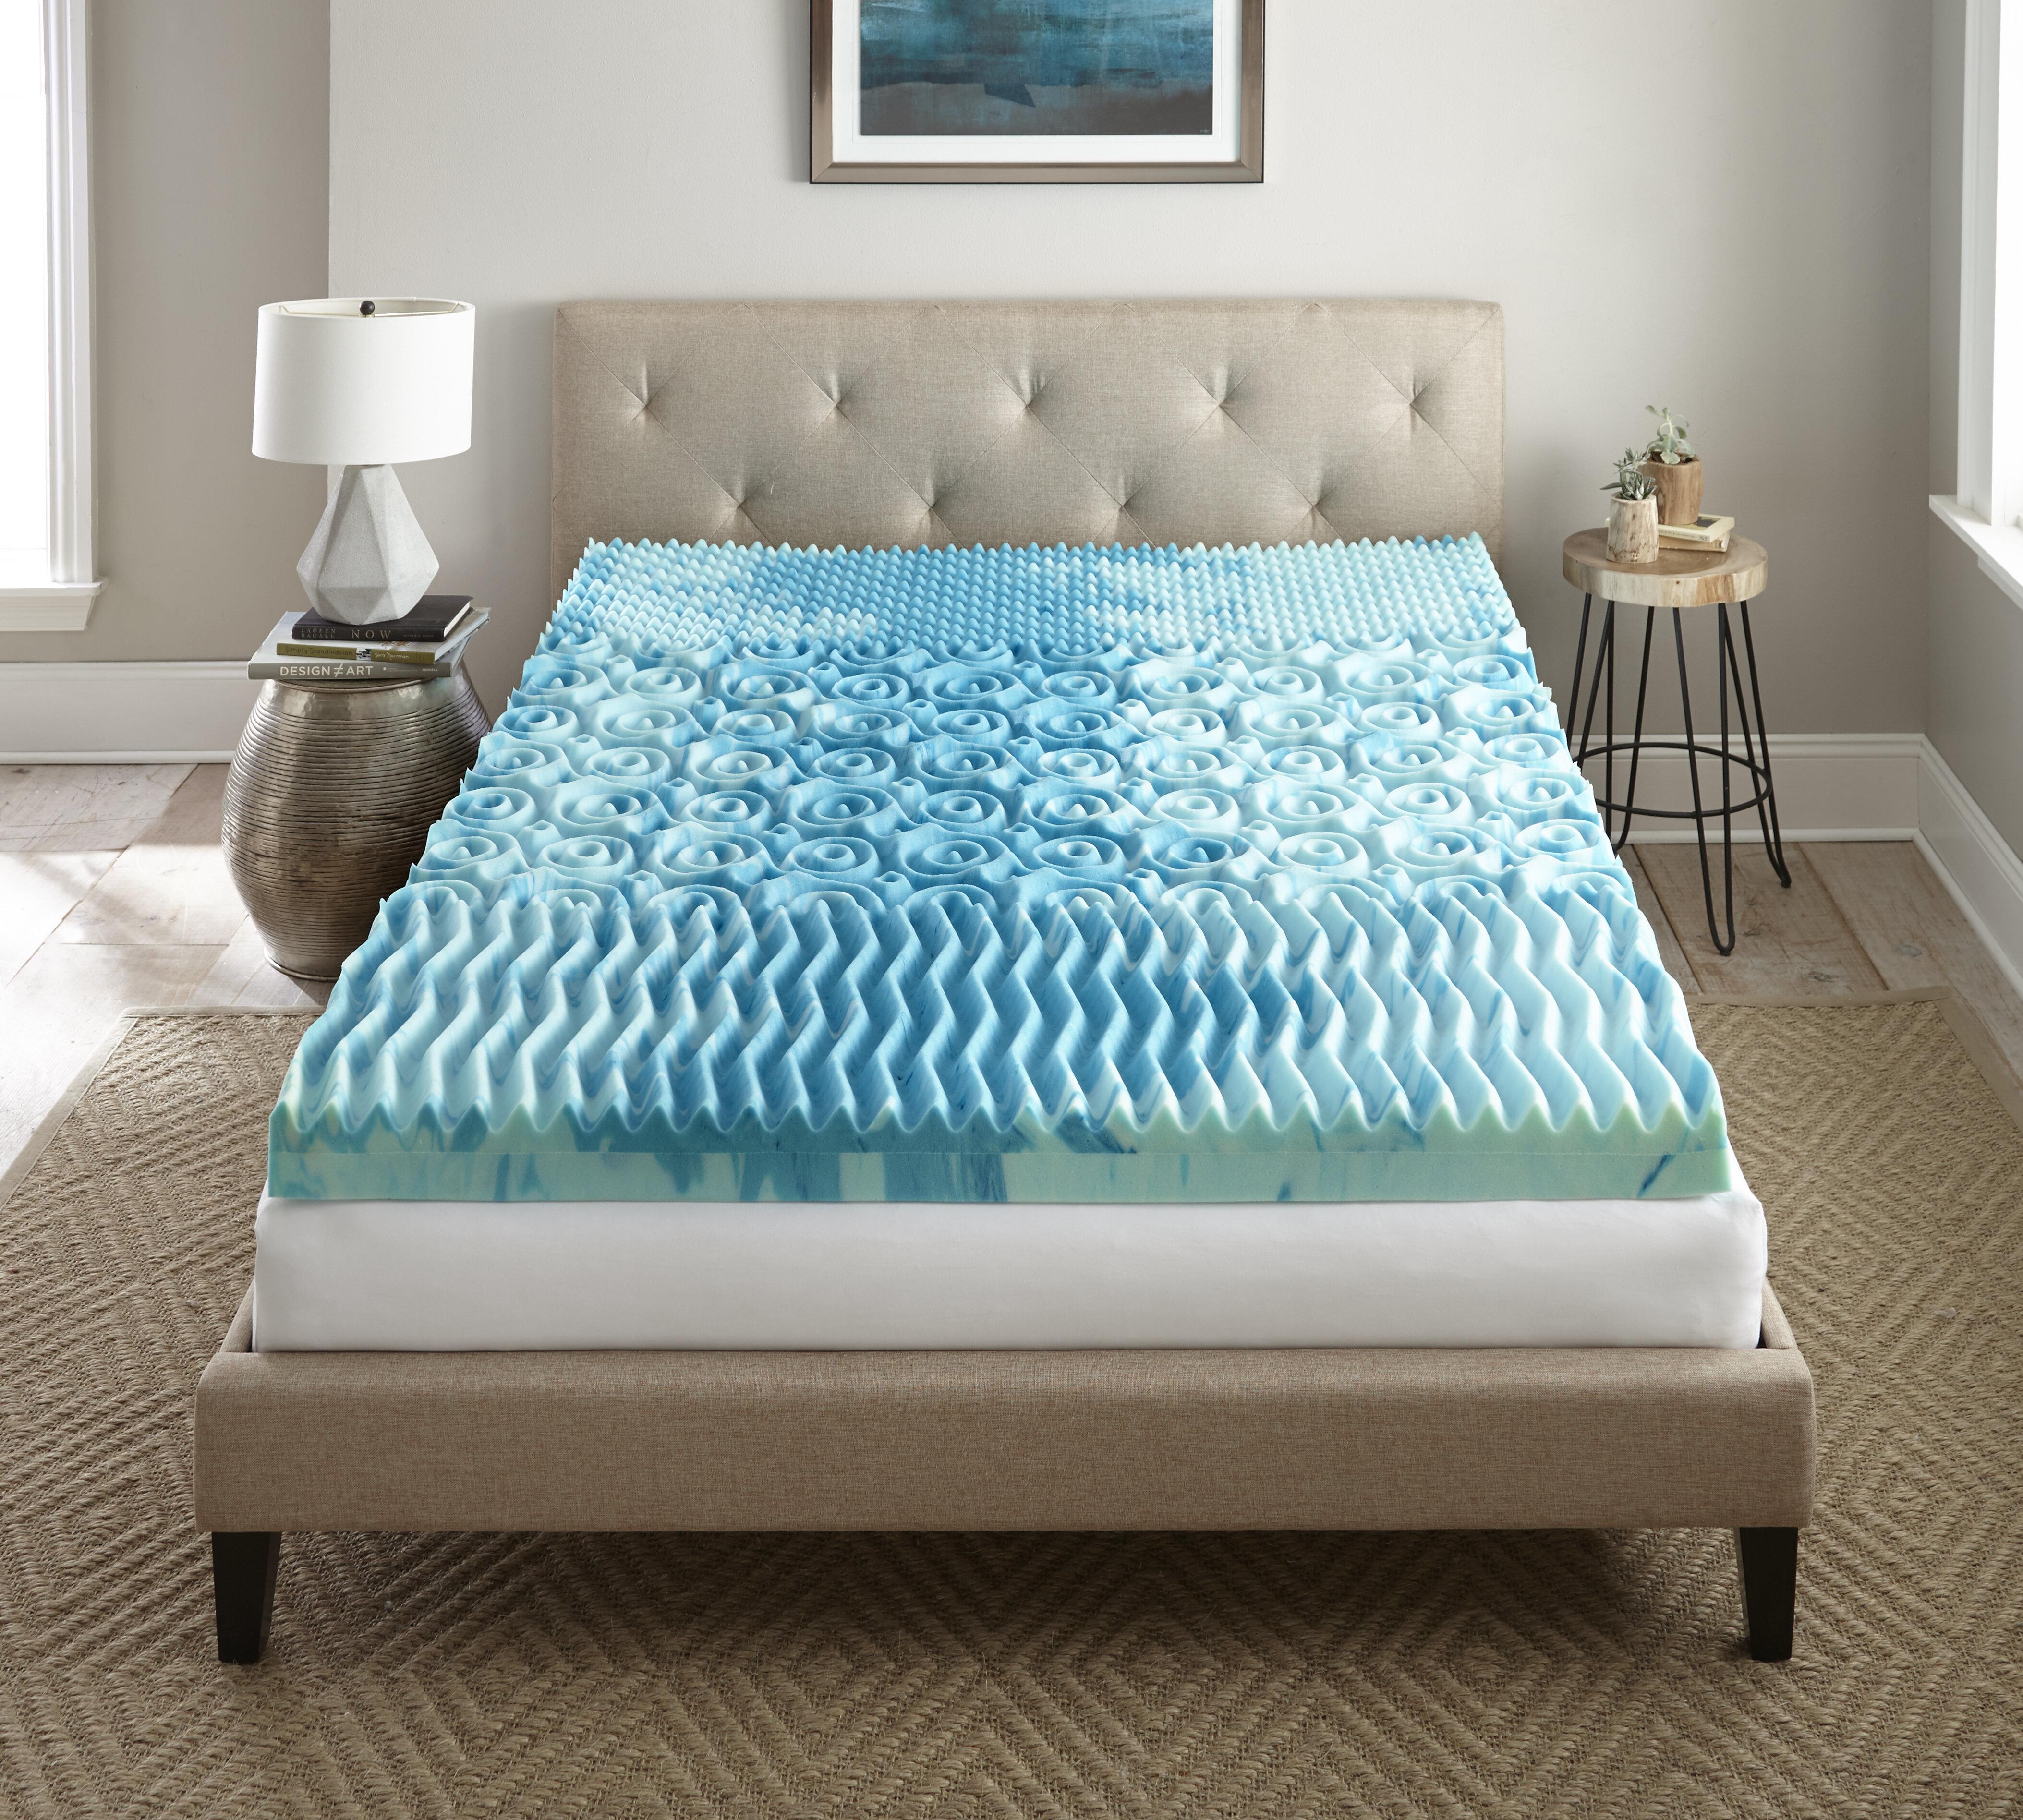 innocor pearl serafina novaform products foam memory gel mattress topper